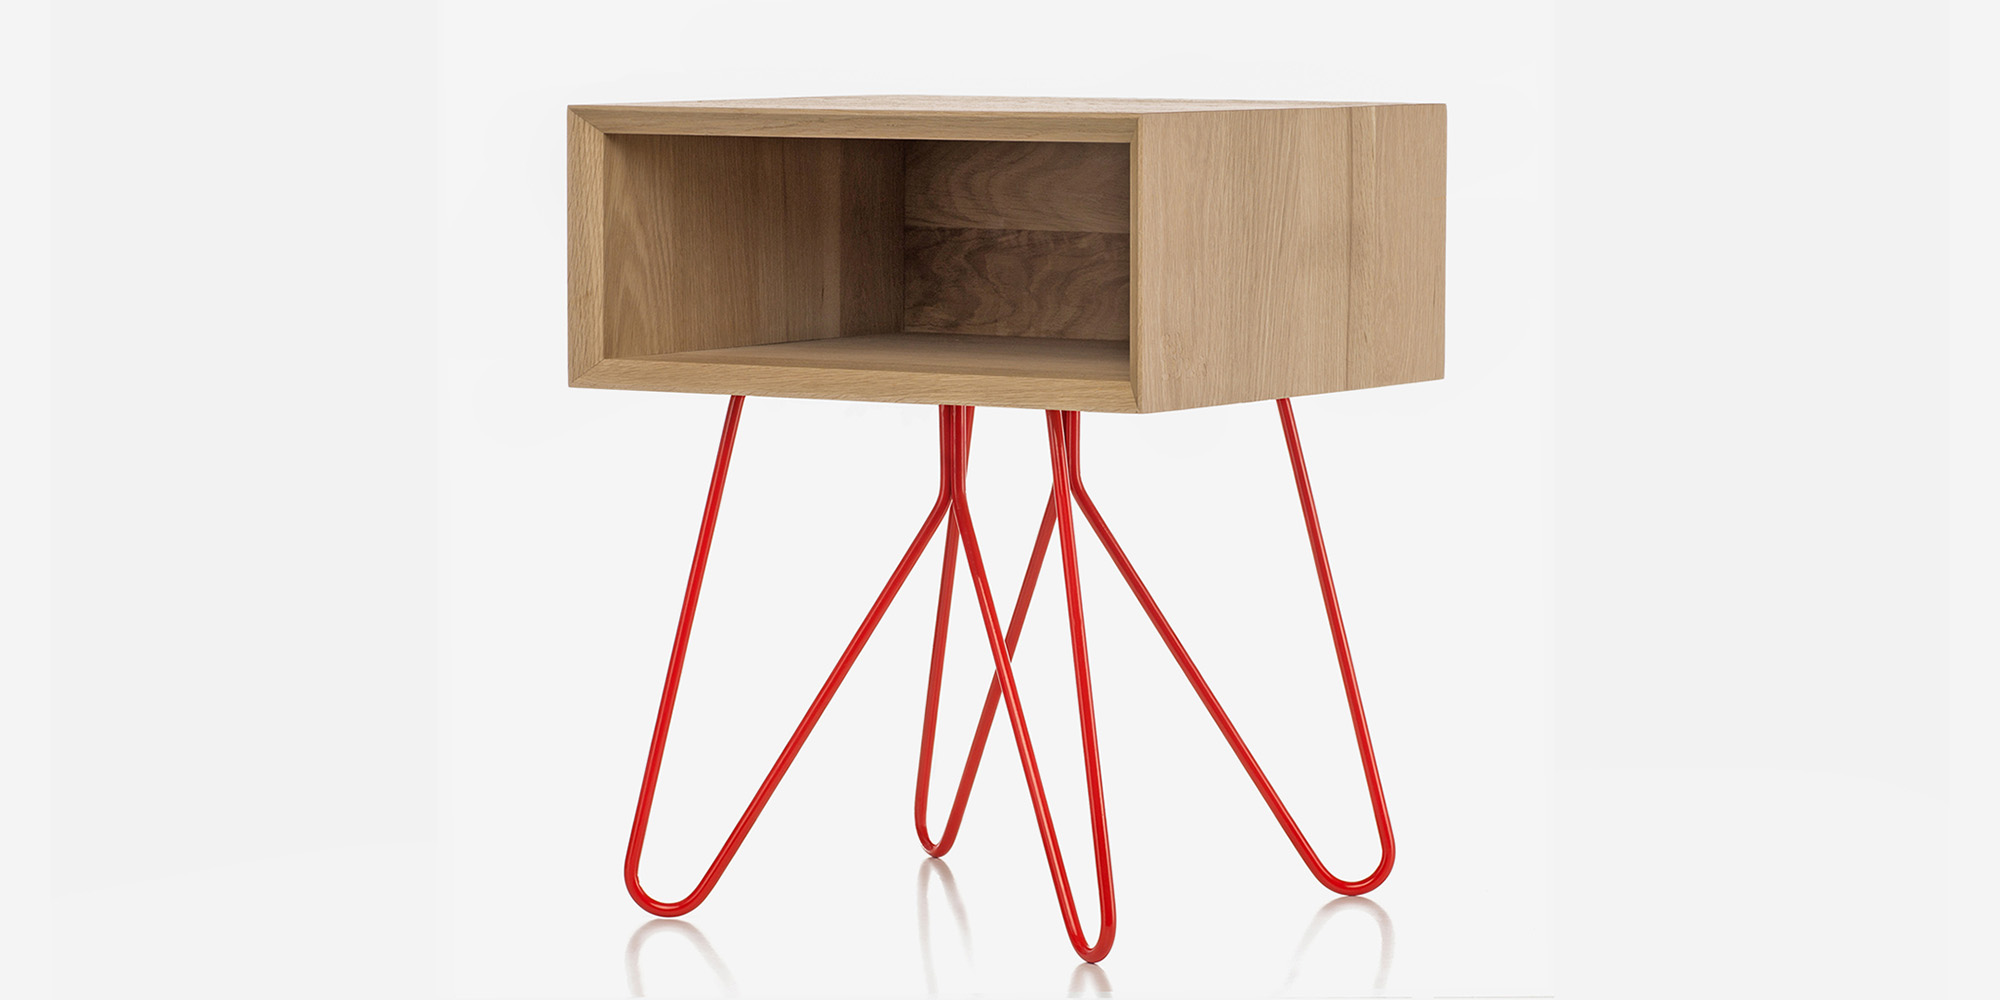 Galula Nove wood bedside table